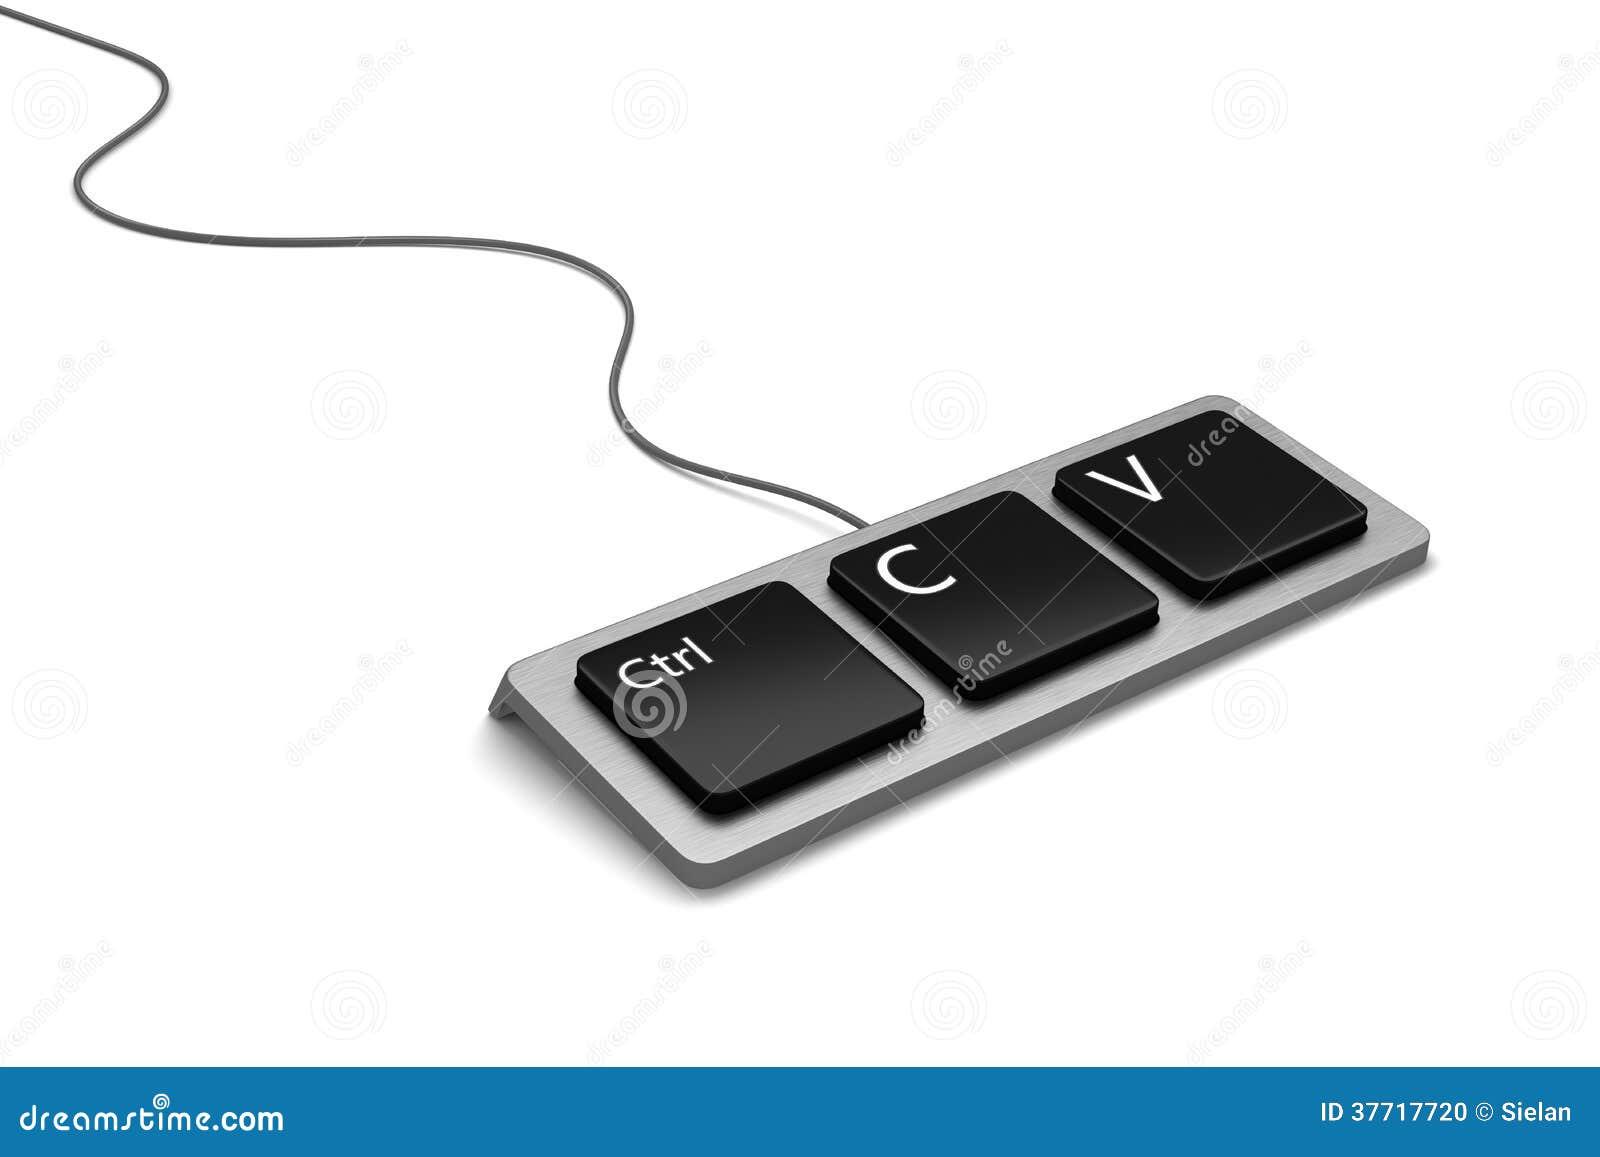 Copy Paste Keyboard Plagiarist Tool Stock Illustration